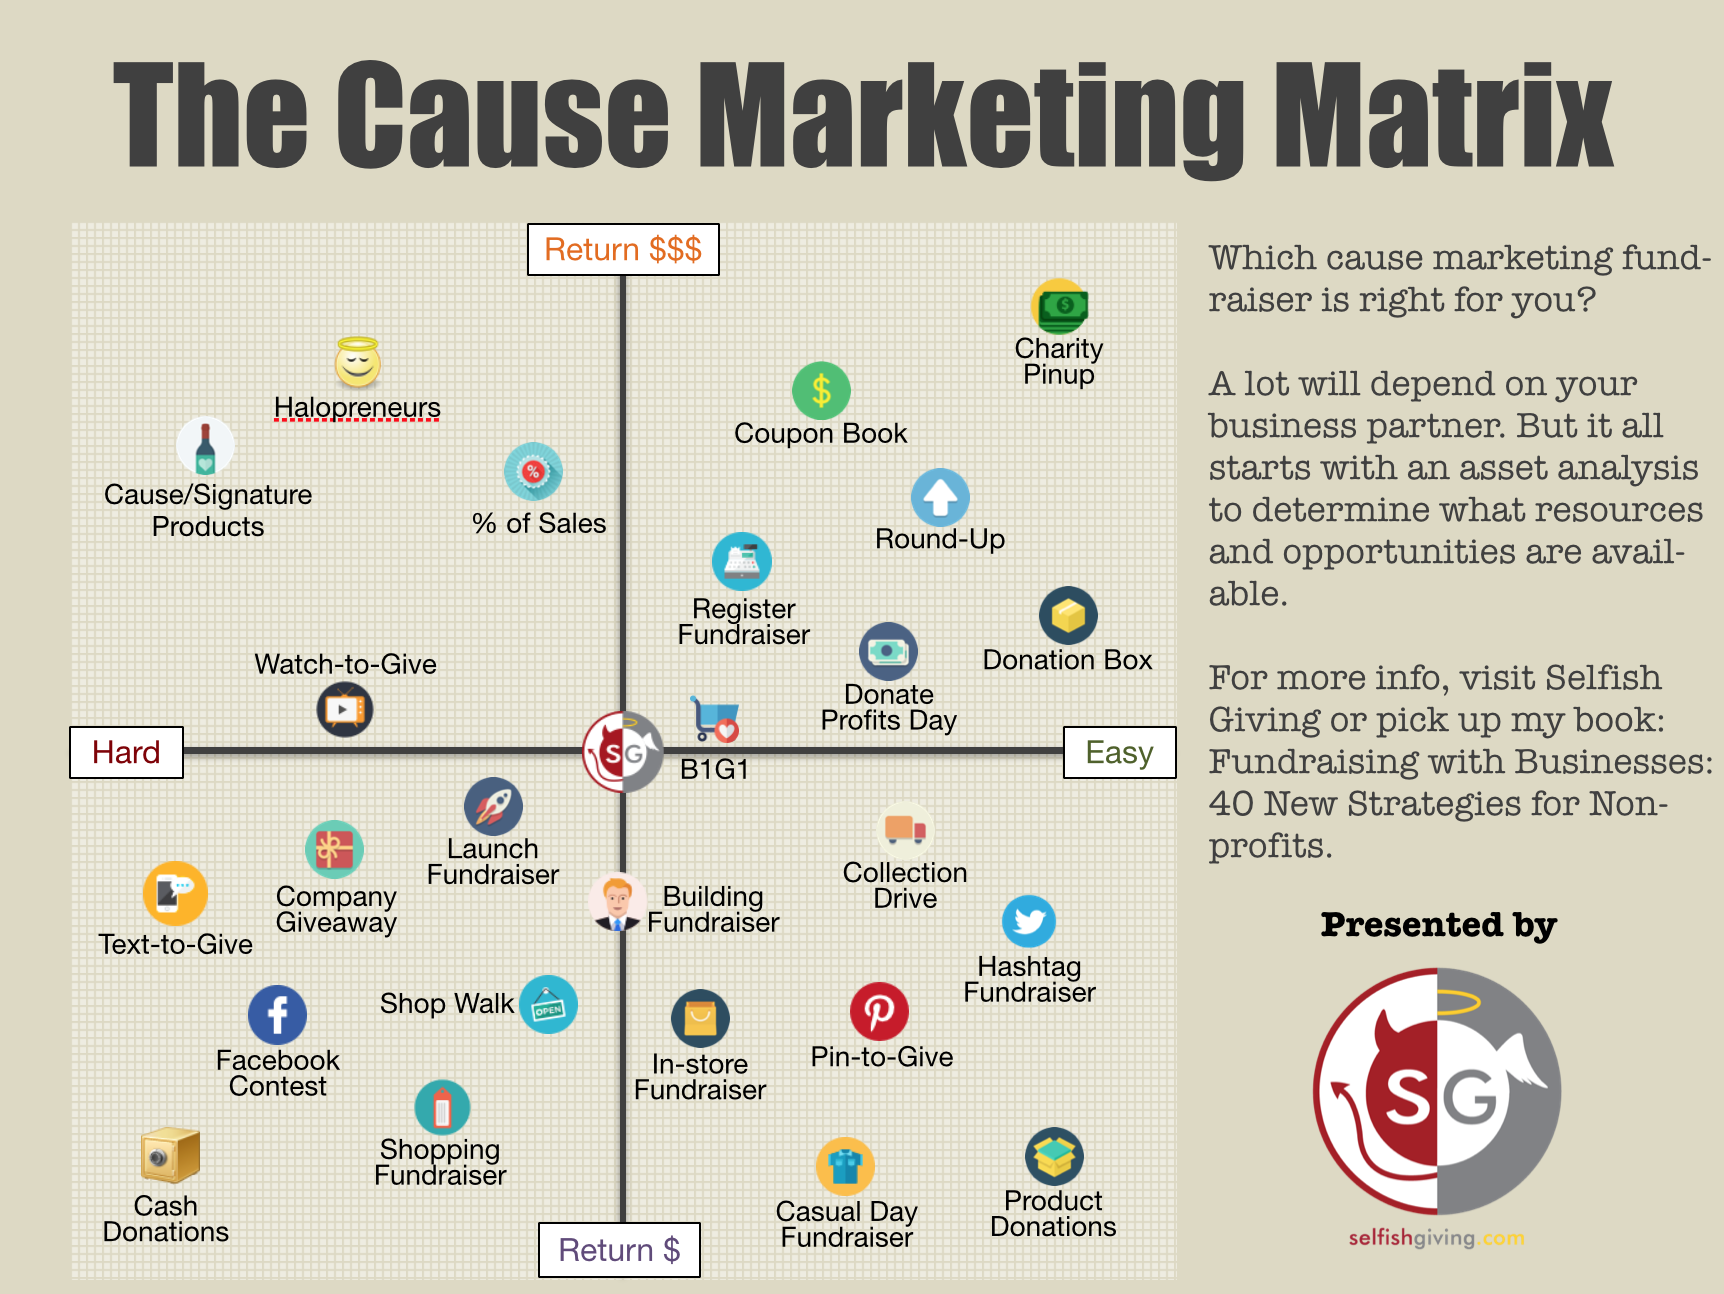 cause marketing fundraiser matrix